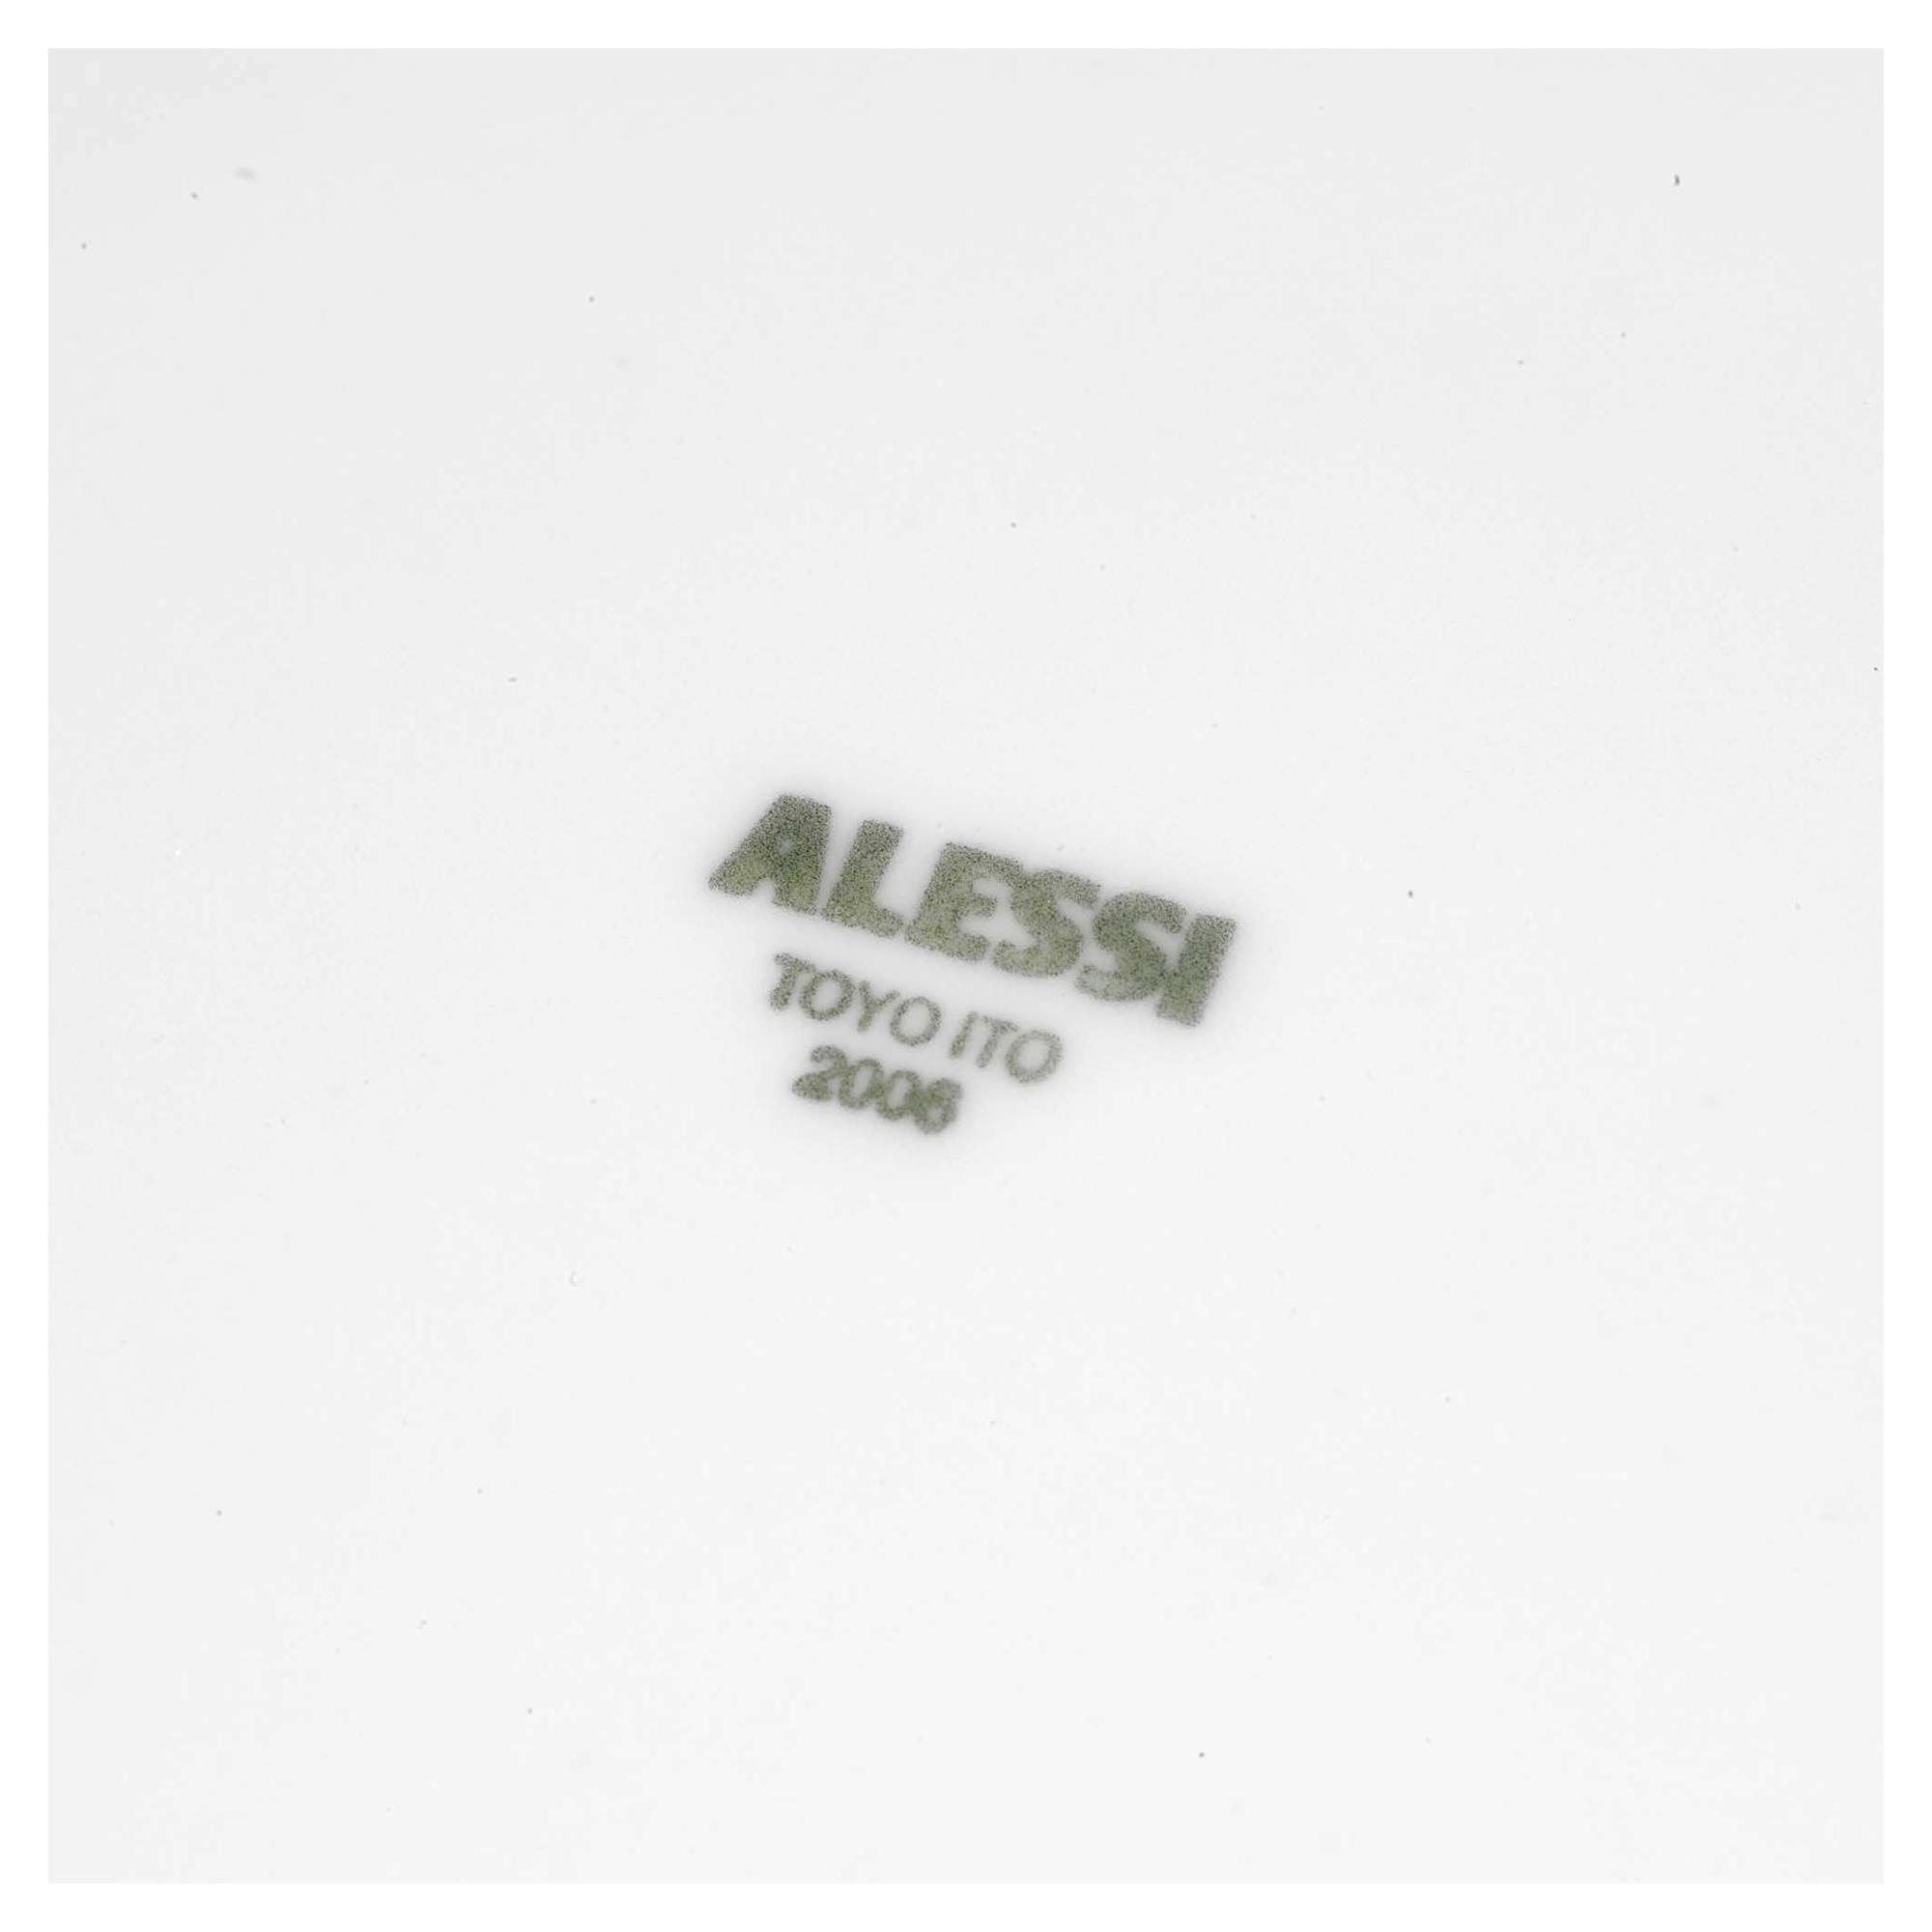 ALESSI KU Dinner Plates [264649]. RRP £42 & Alessi KU Set of 6 Modern Porcelain Design Dinner Plates Tableware ...